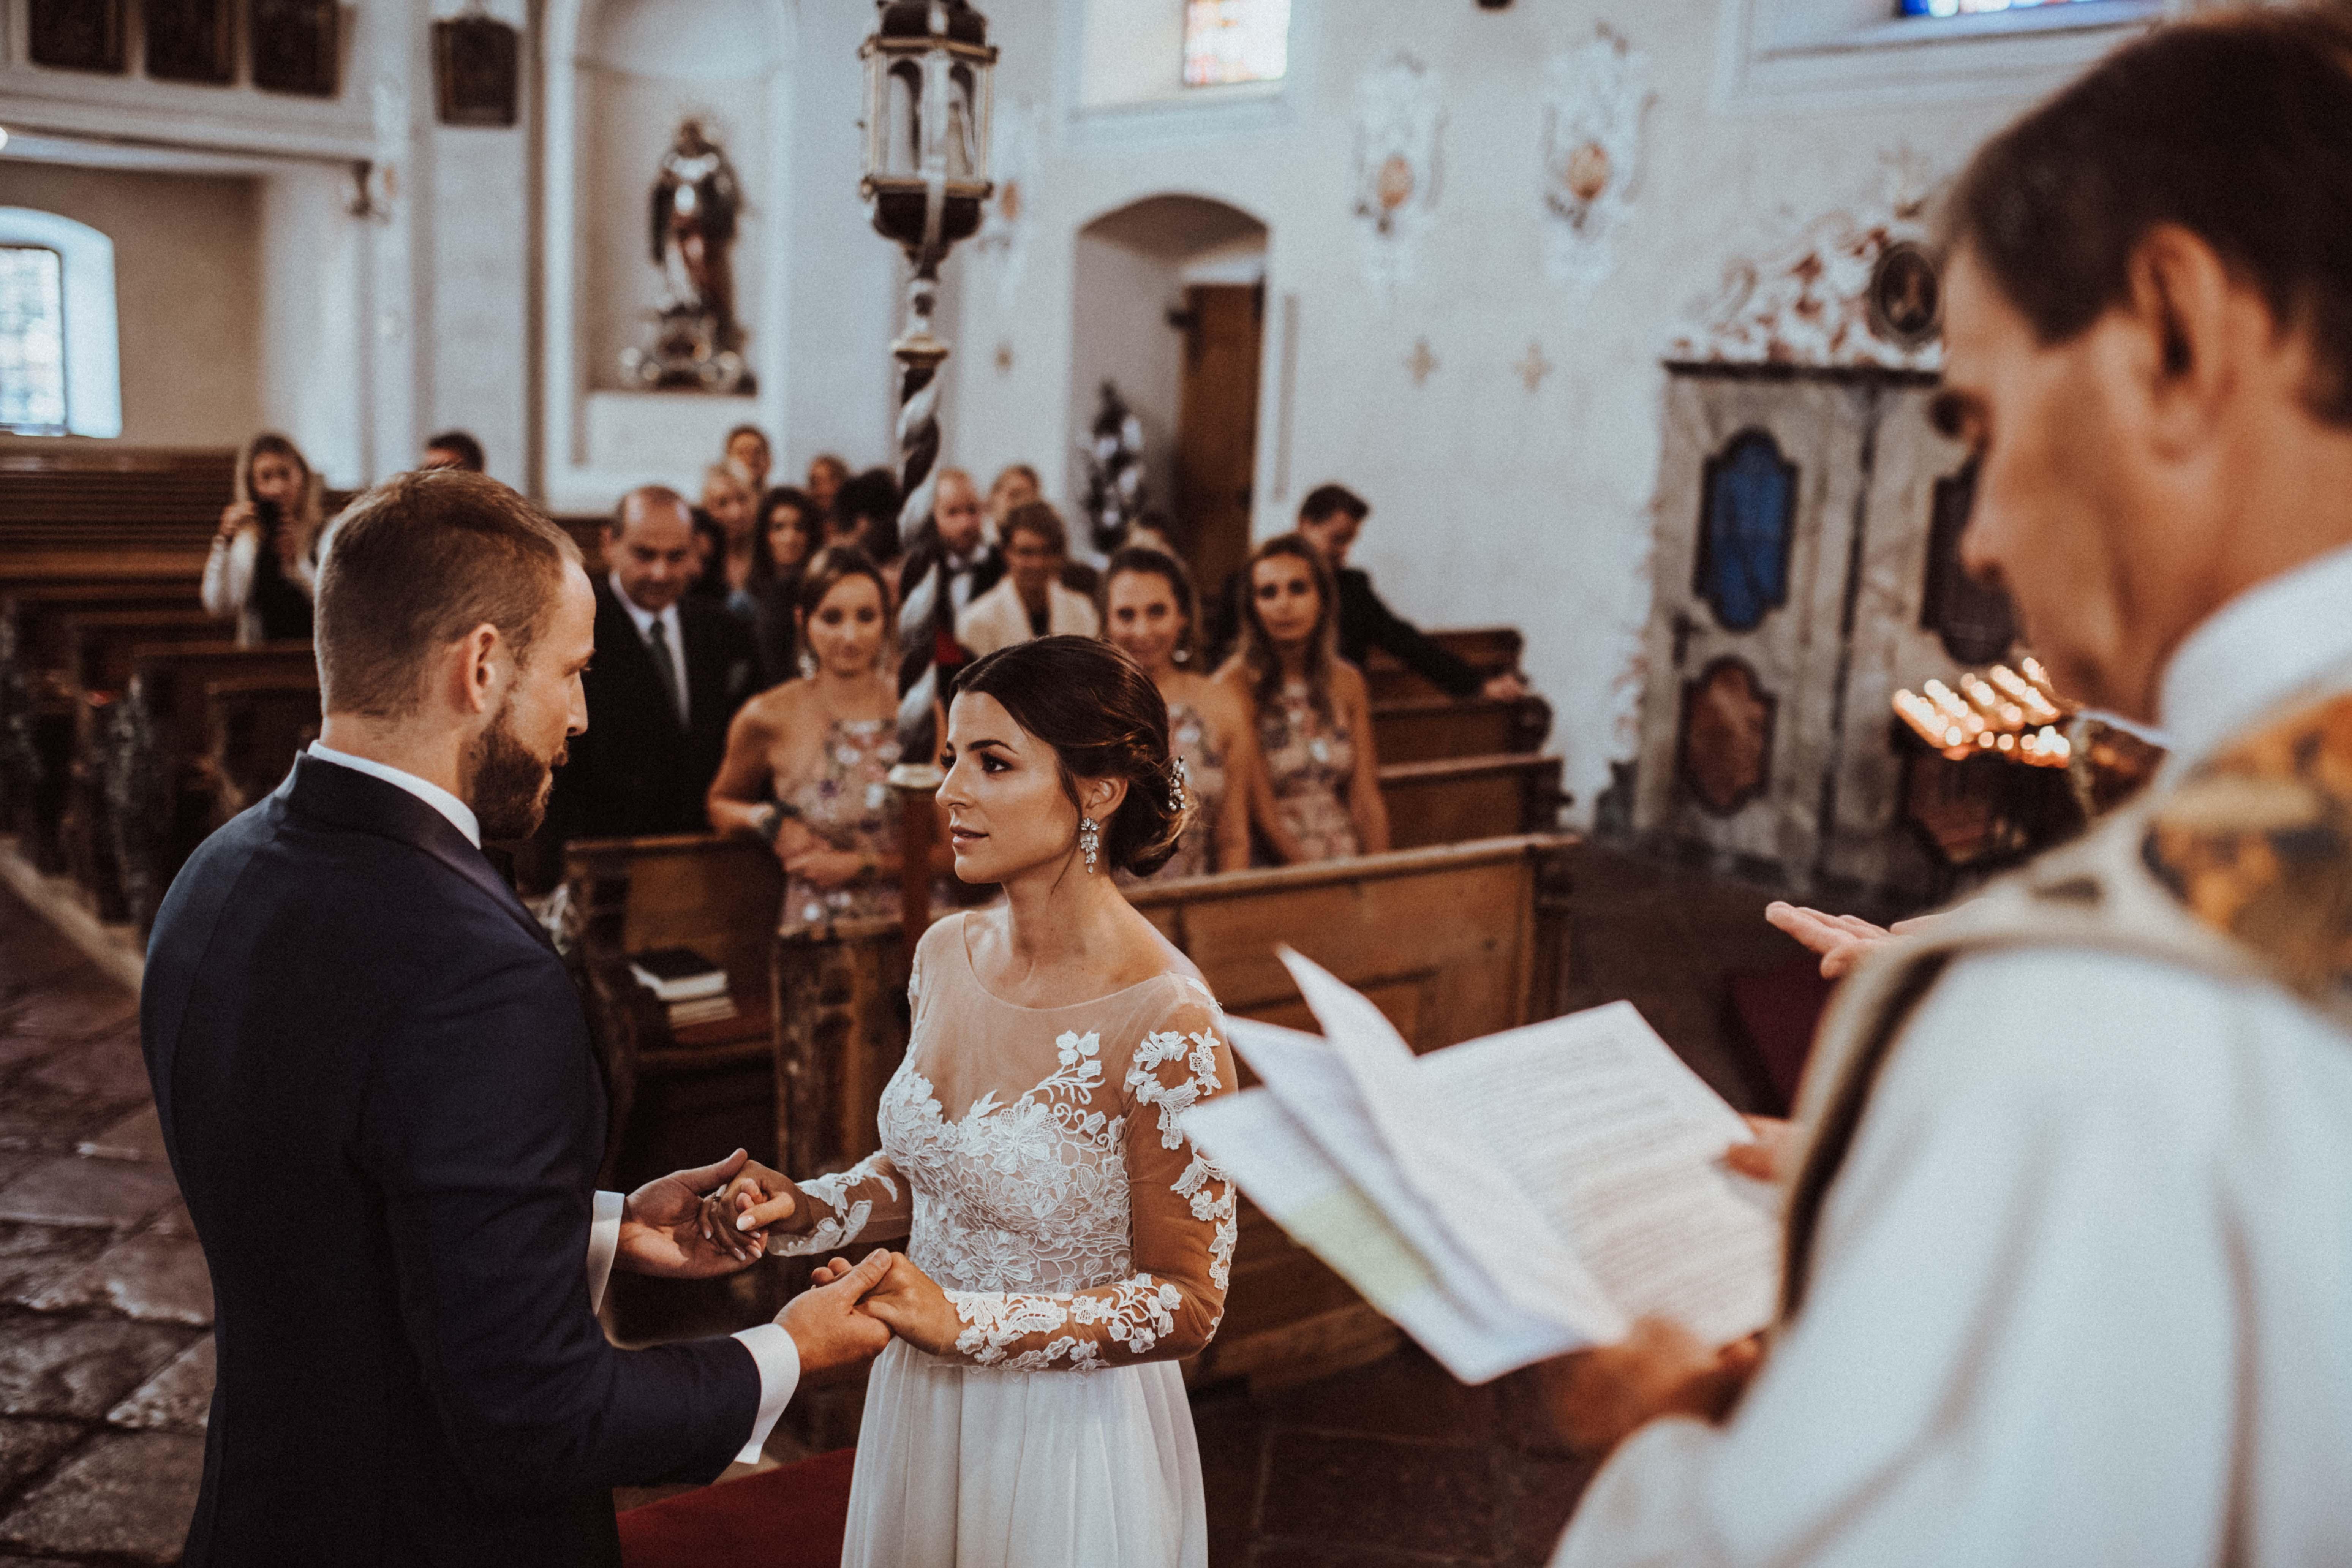 emotional ehegelöbnis Sonja Pöhlmann Photography Wedding München Bayern